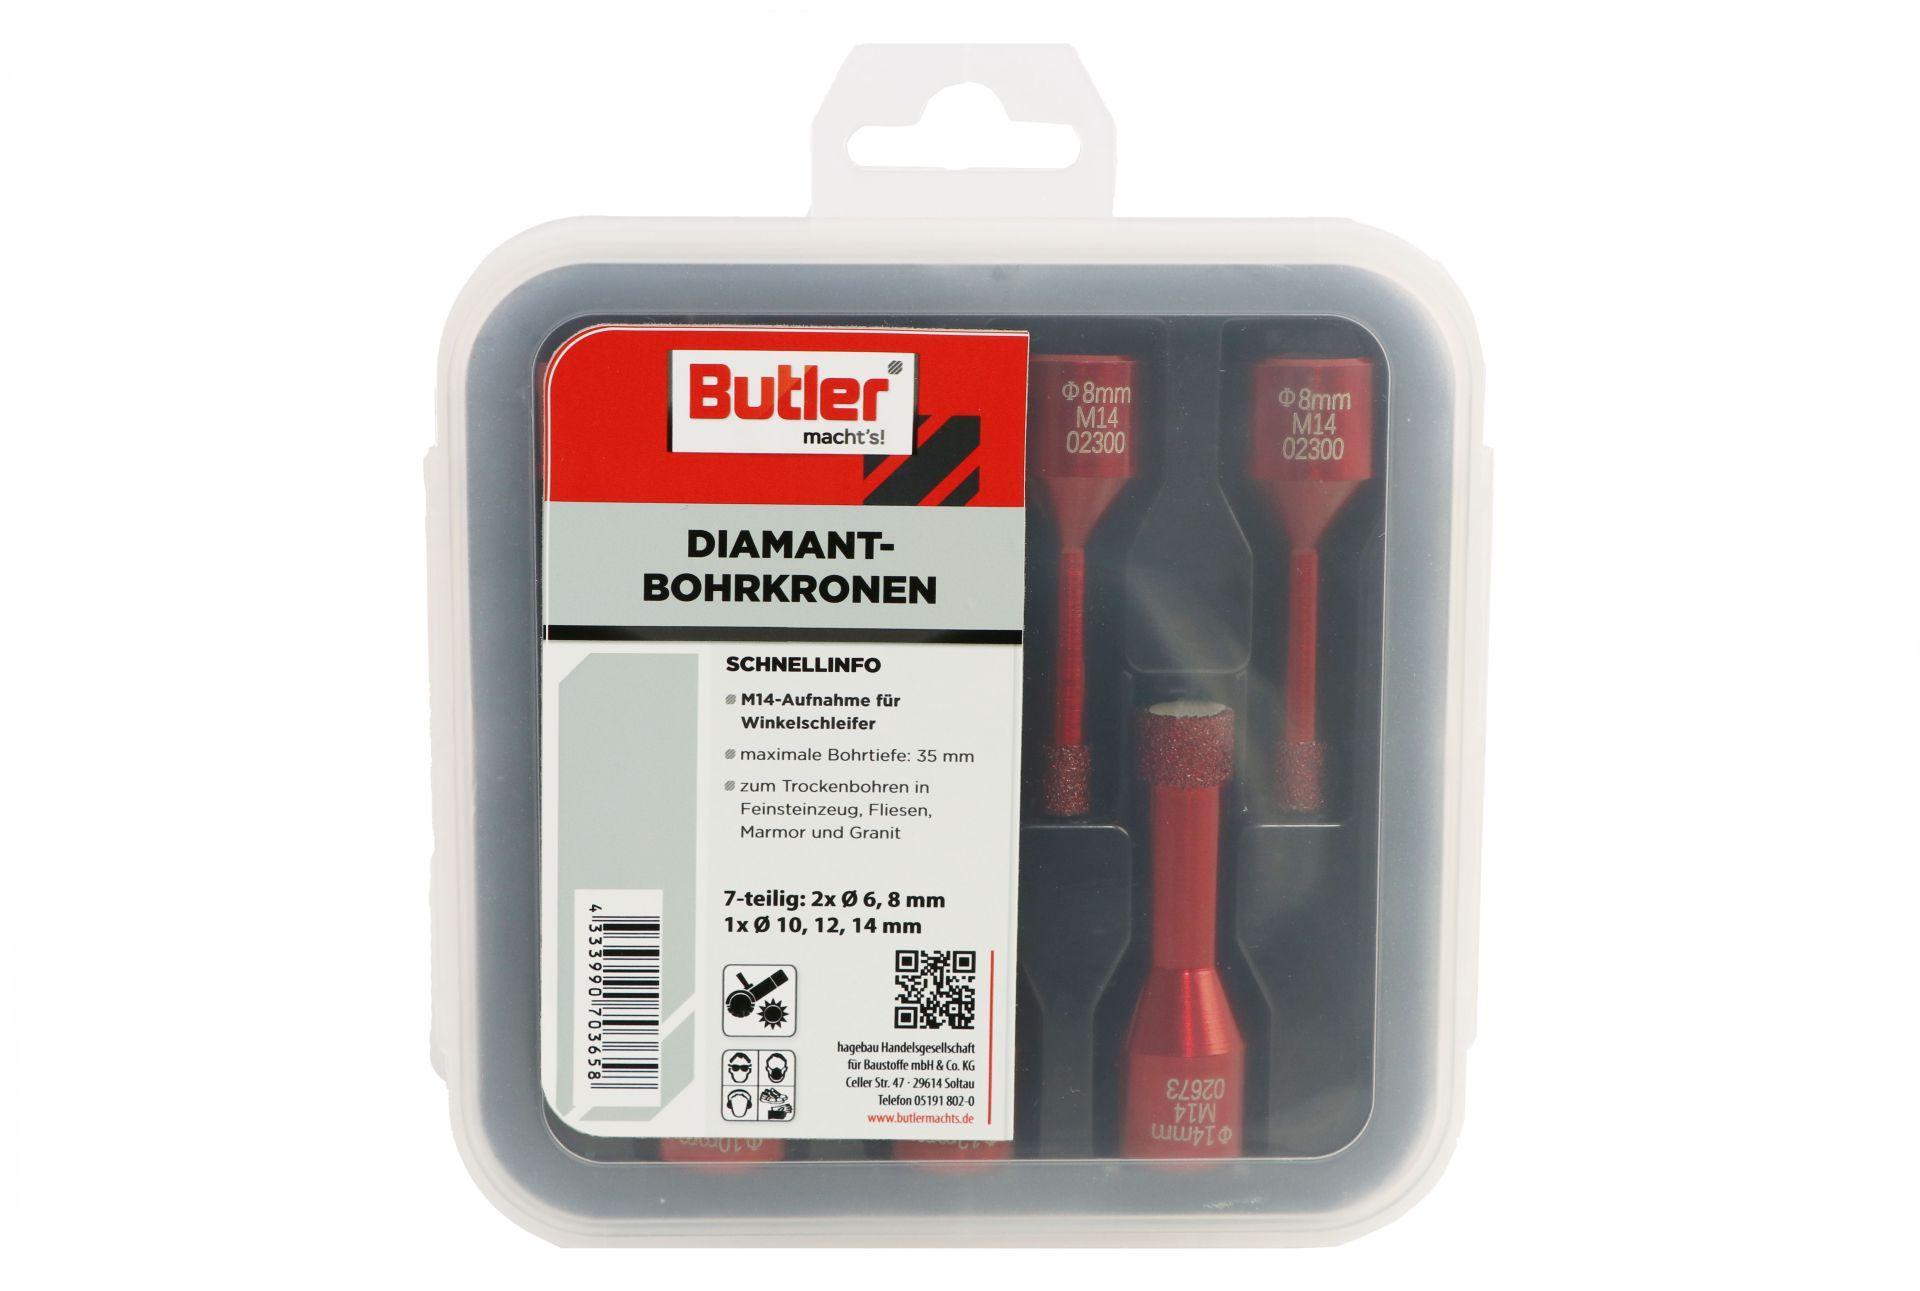 Butler macht's! Diamant-Bohrkronen 7-er Set, 2 x Ø 6,8, je 1 x Ø 10, 12, 14, Aufnahme M14